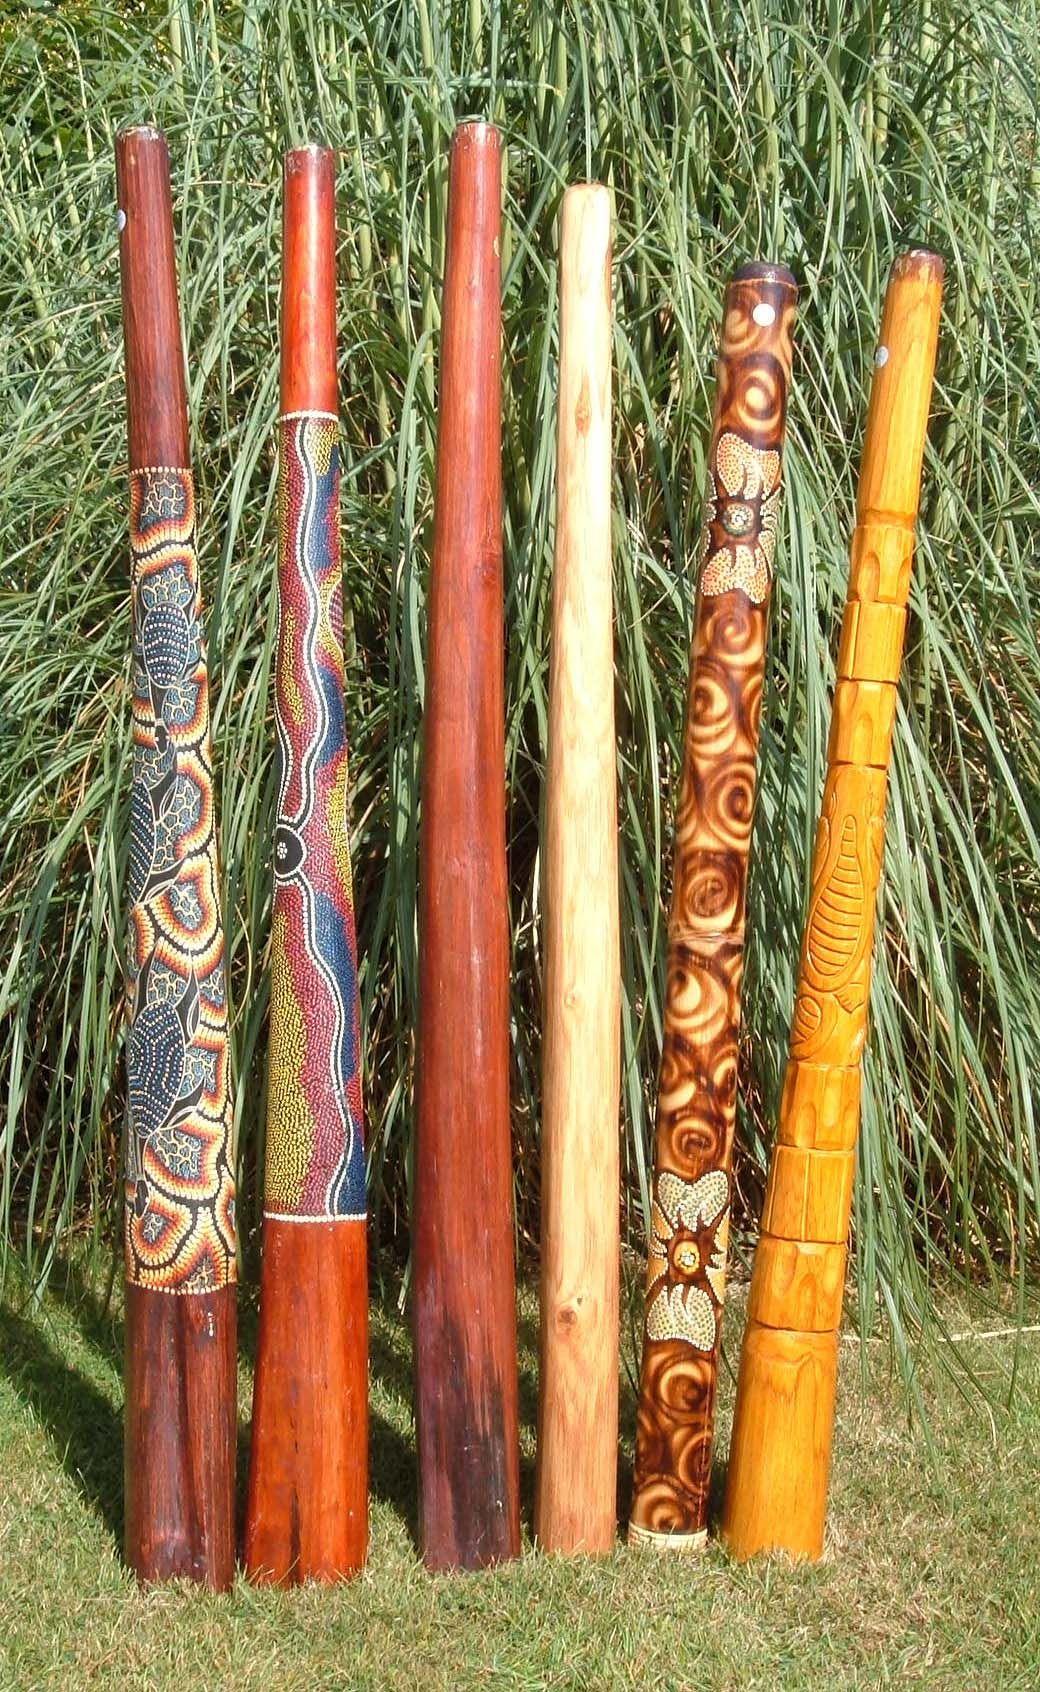 how to play travel didgeridoo